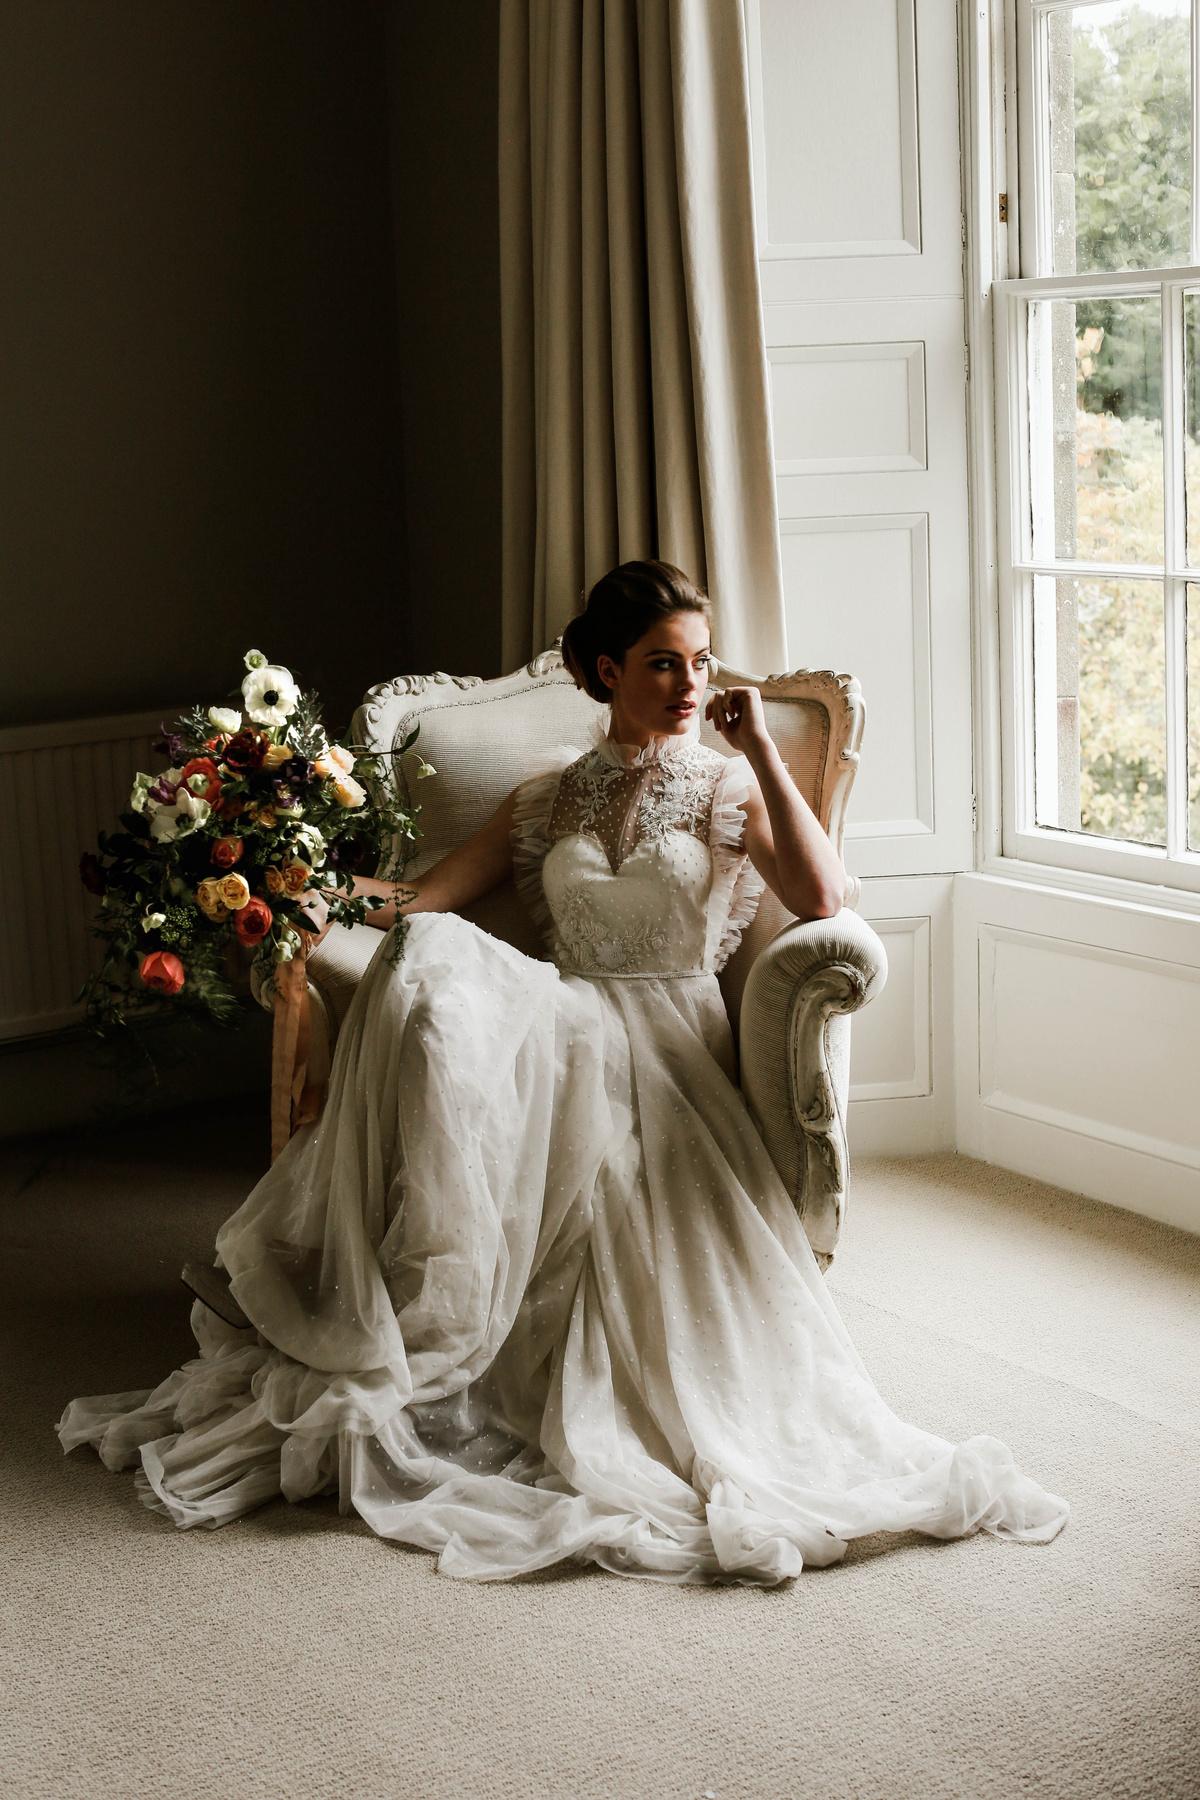 emma-bridal-photographer-cornwall-uk-taylor-content.jpg